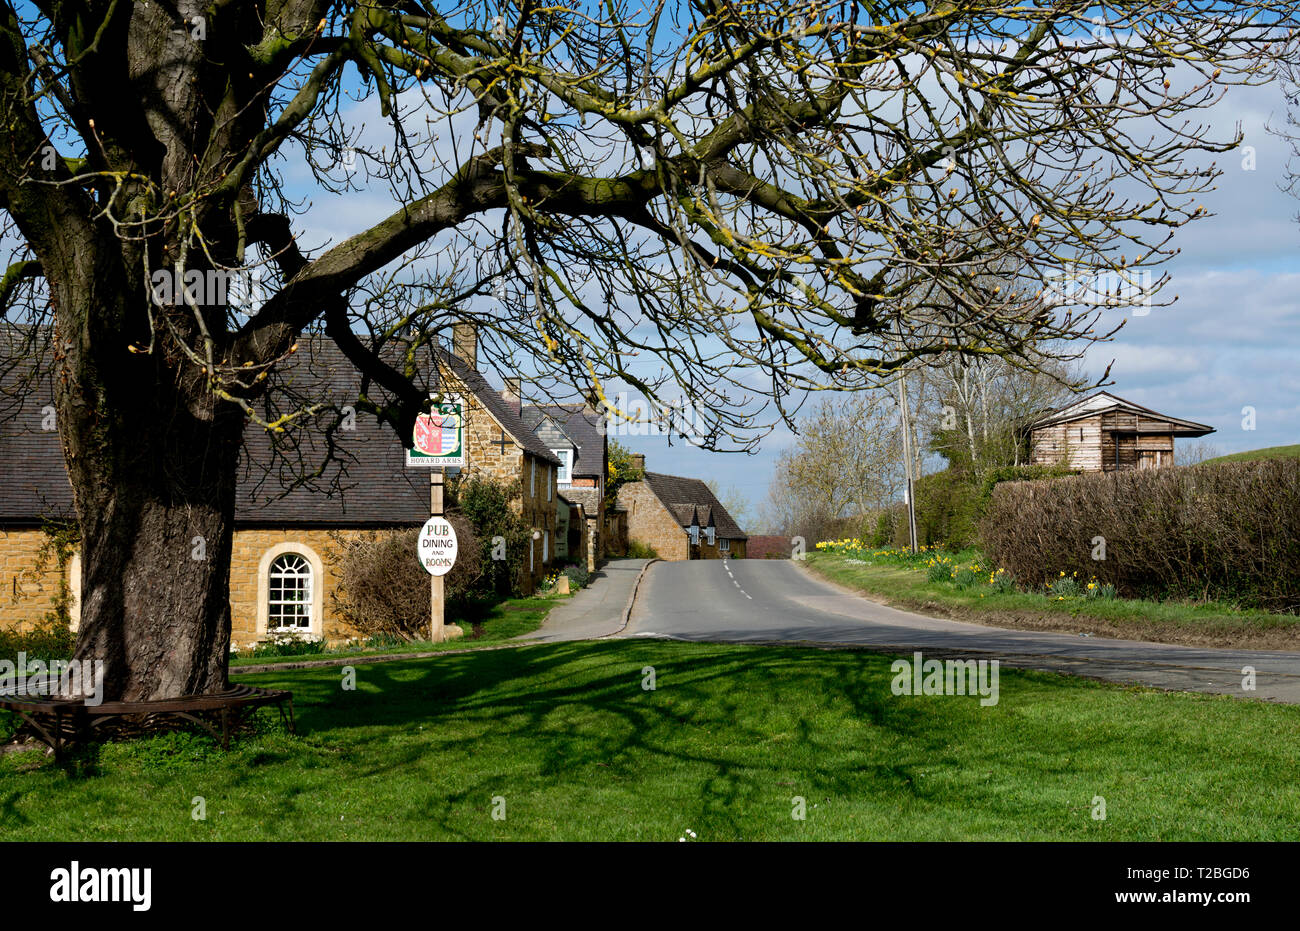 Horse chestnut tree on the village green, Ilmington, Warwickshire, England, UK - Stock Image